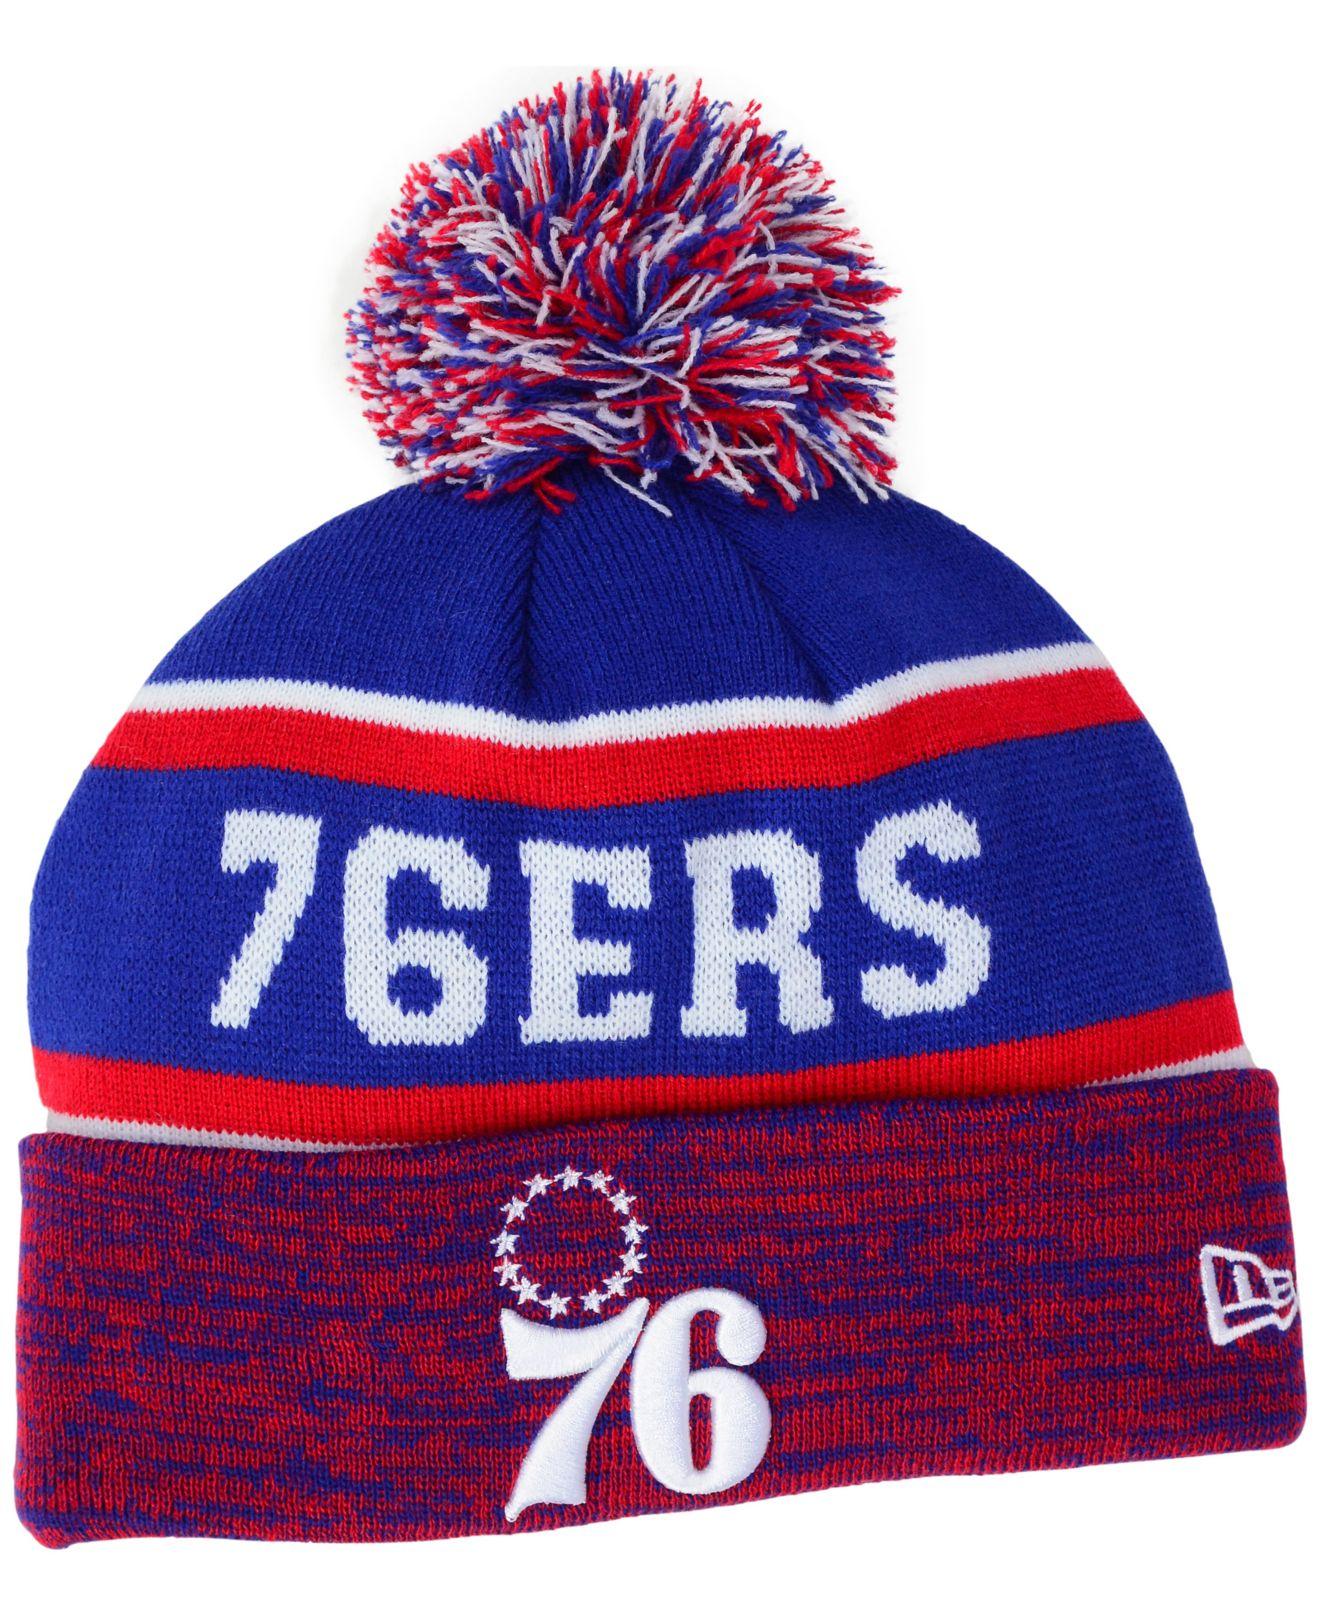 66bb432187d Lyst - Ktz Philadelphia 76ers Marled Cuff Knit Hat in Red for Men